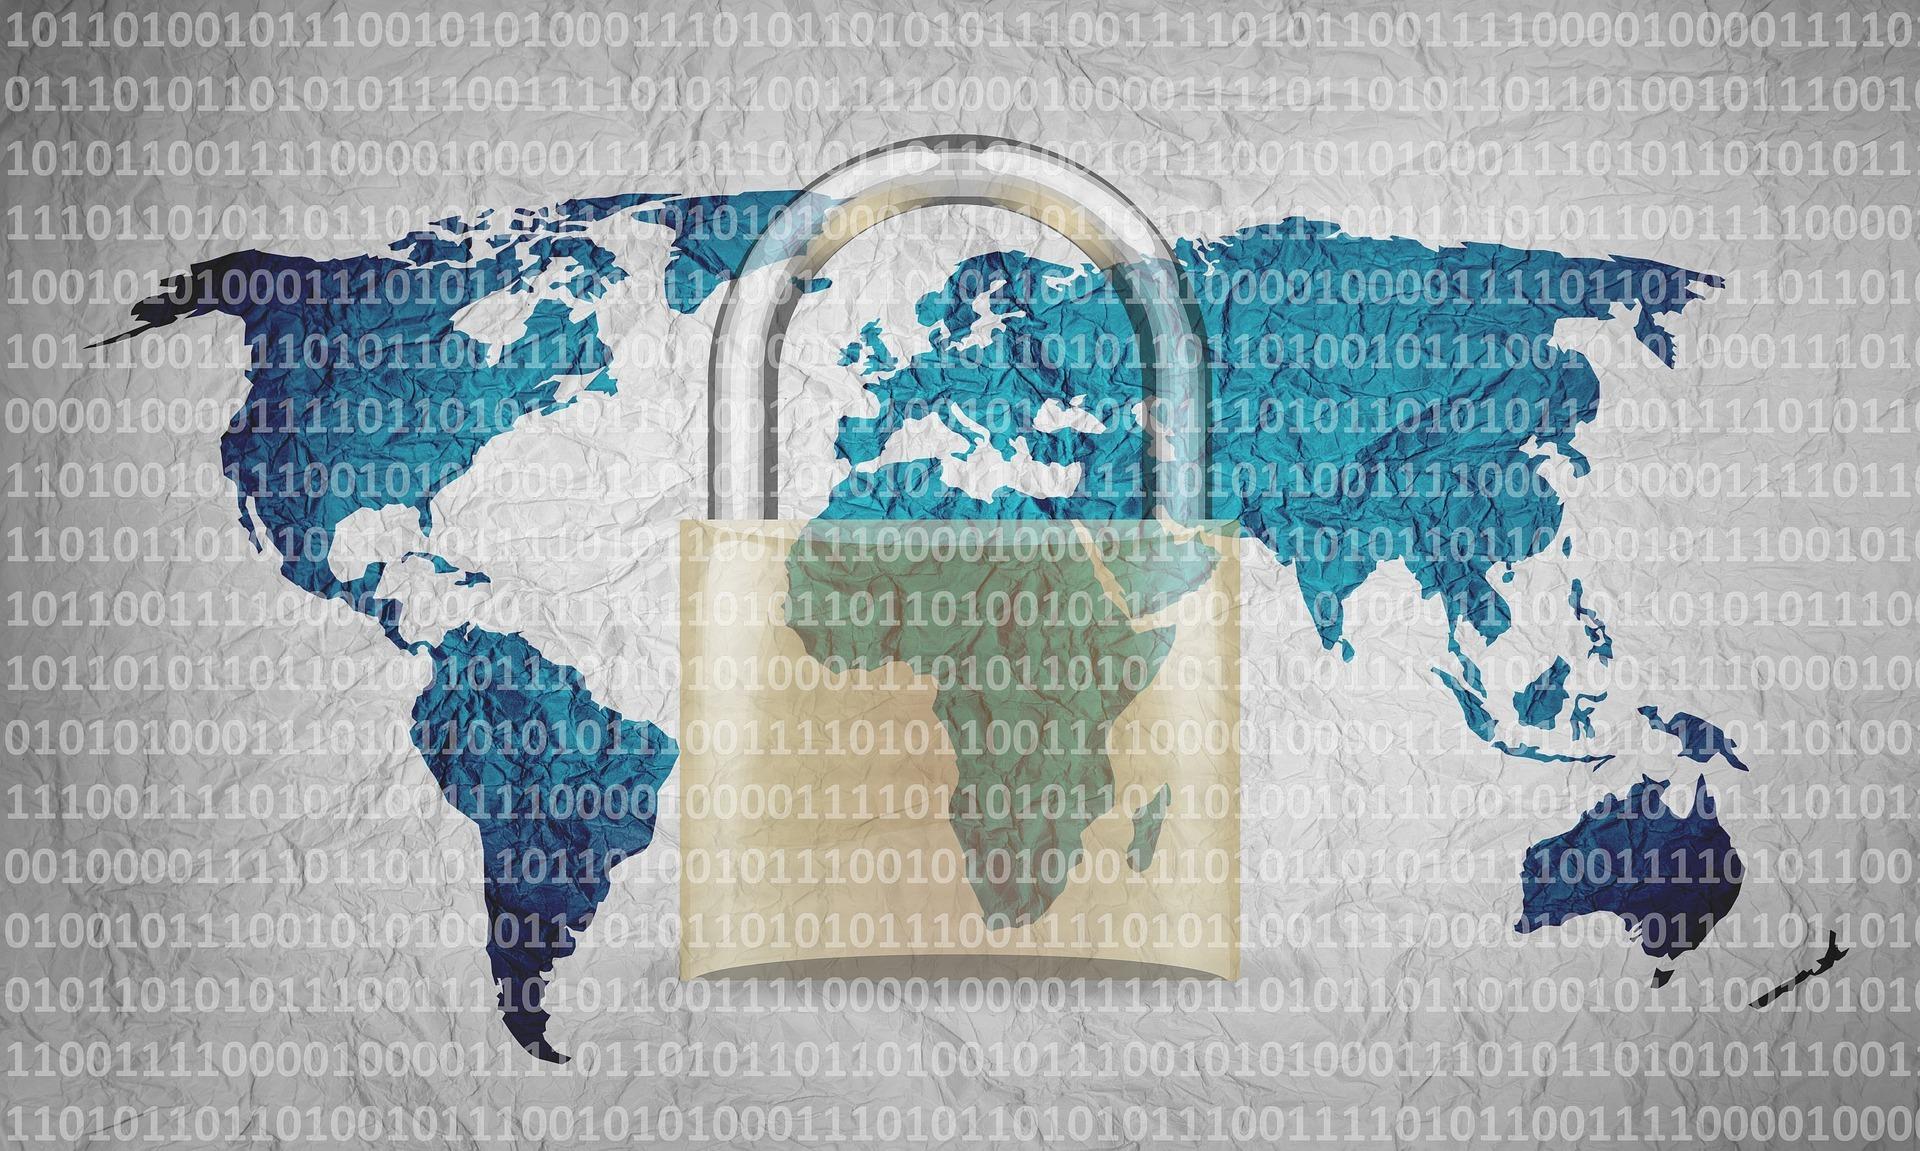 cyber-security-31942861920-1633686196.jpg